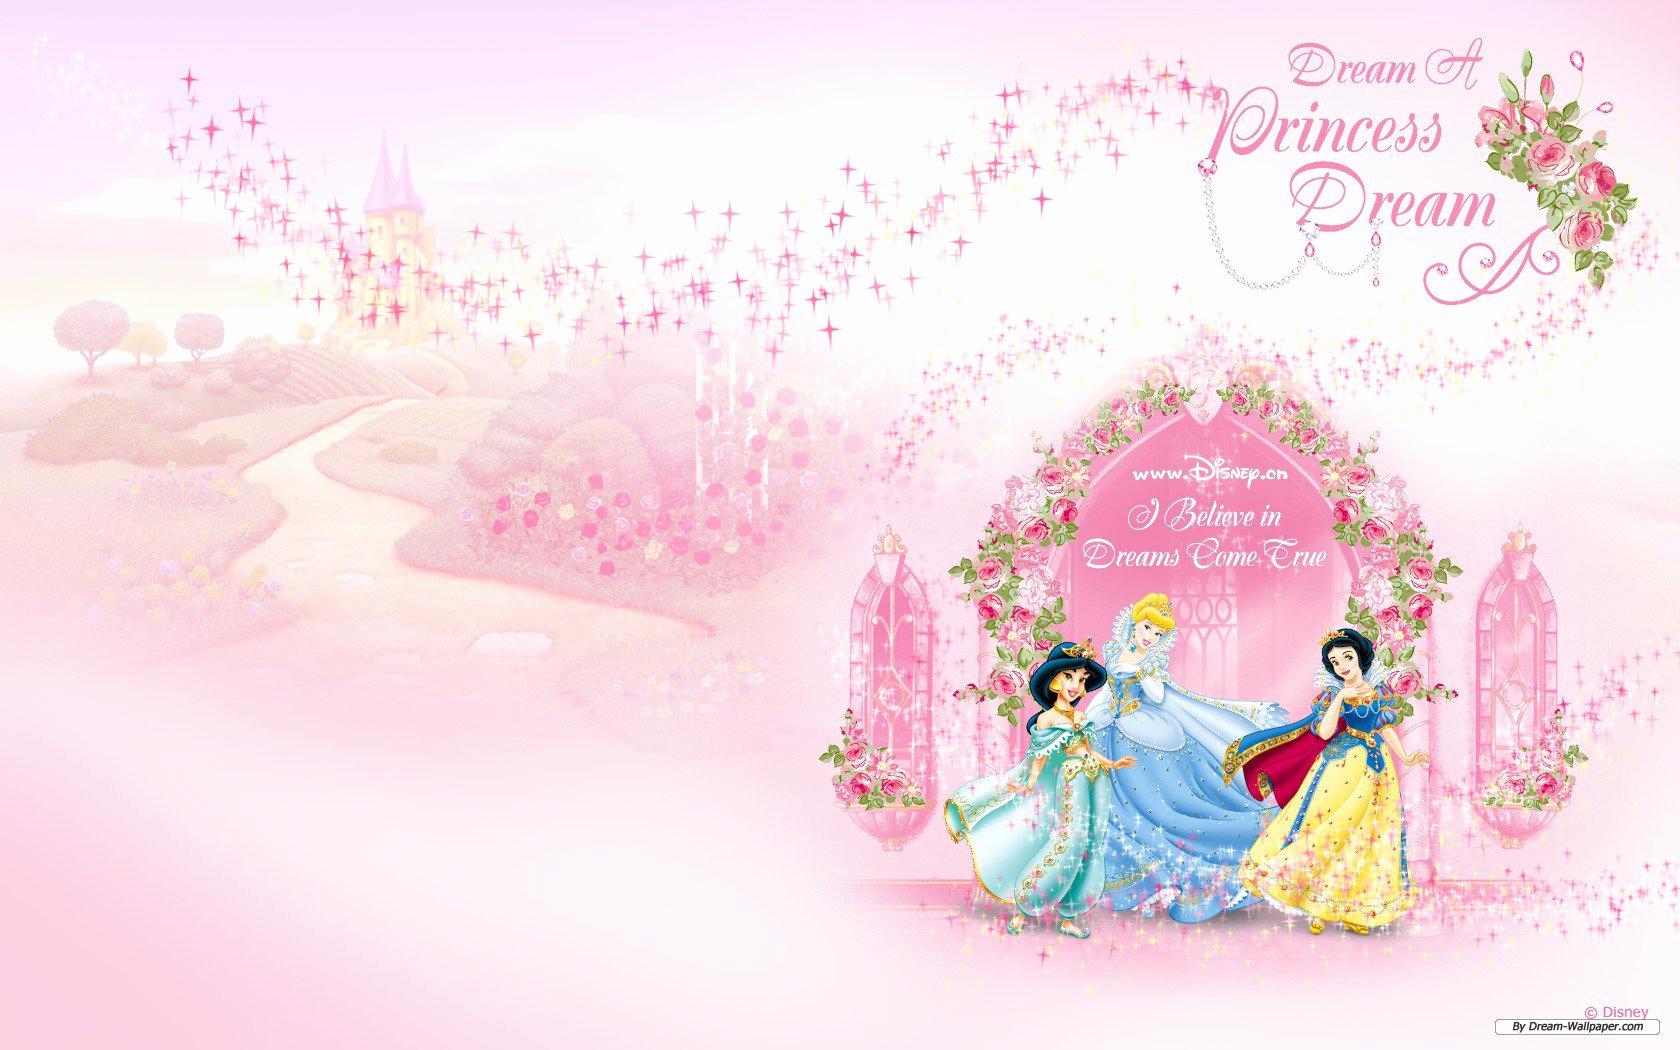 Free Disney Princess Invitation Template Elegant Disney Princess Invitation Templates Free